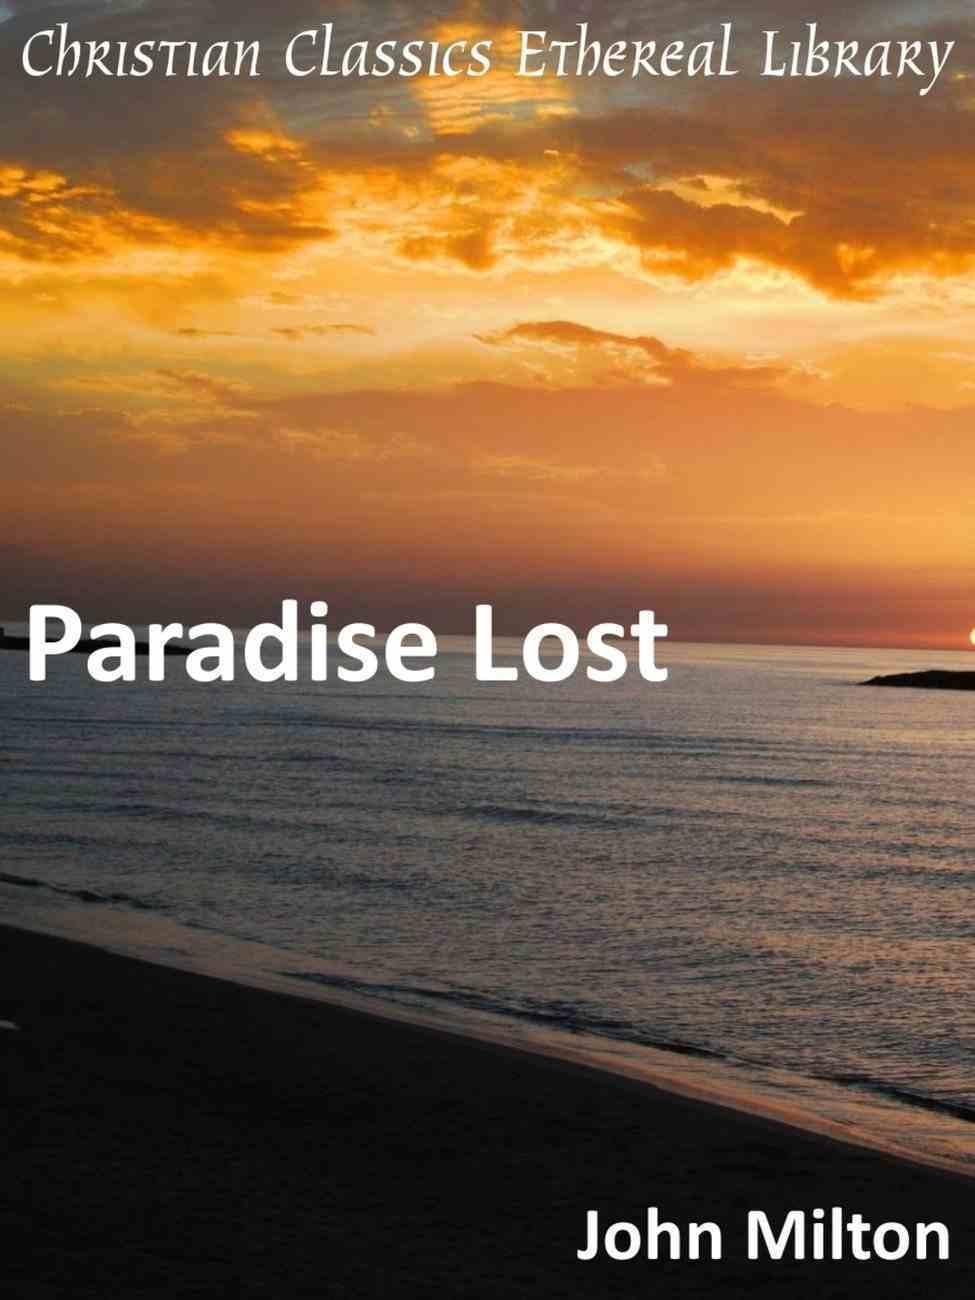 Paradise Lost (Penguin Black Classics Series) Paperback